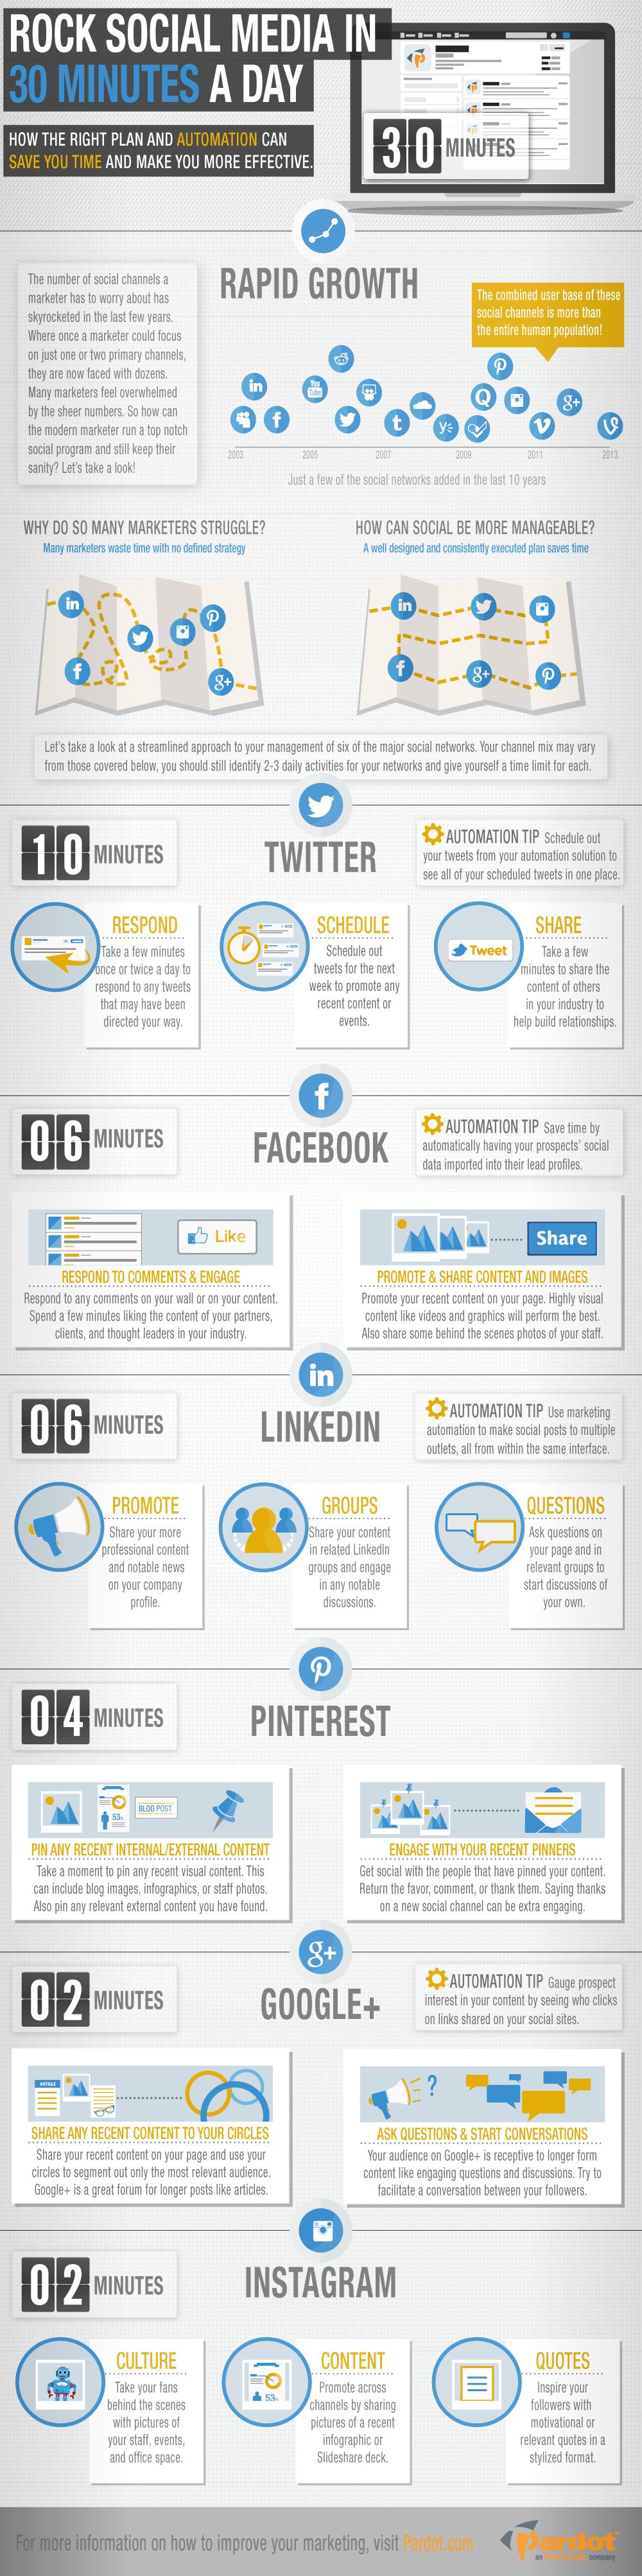 30 Minuten Social Media pro Tag reichen